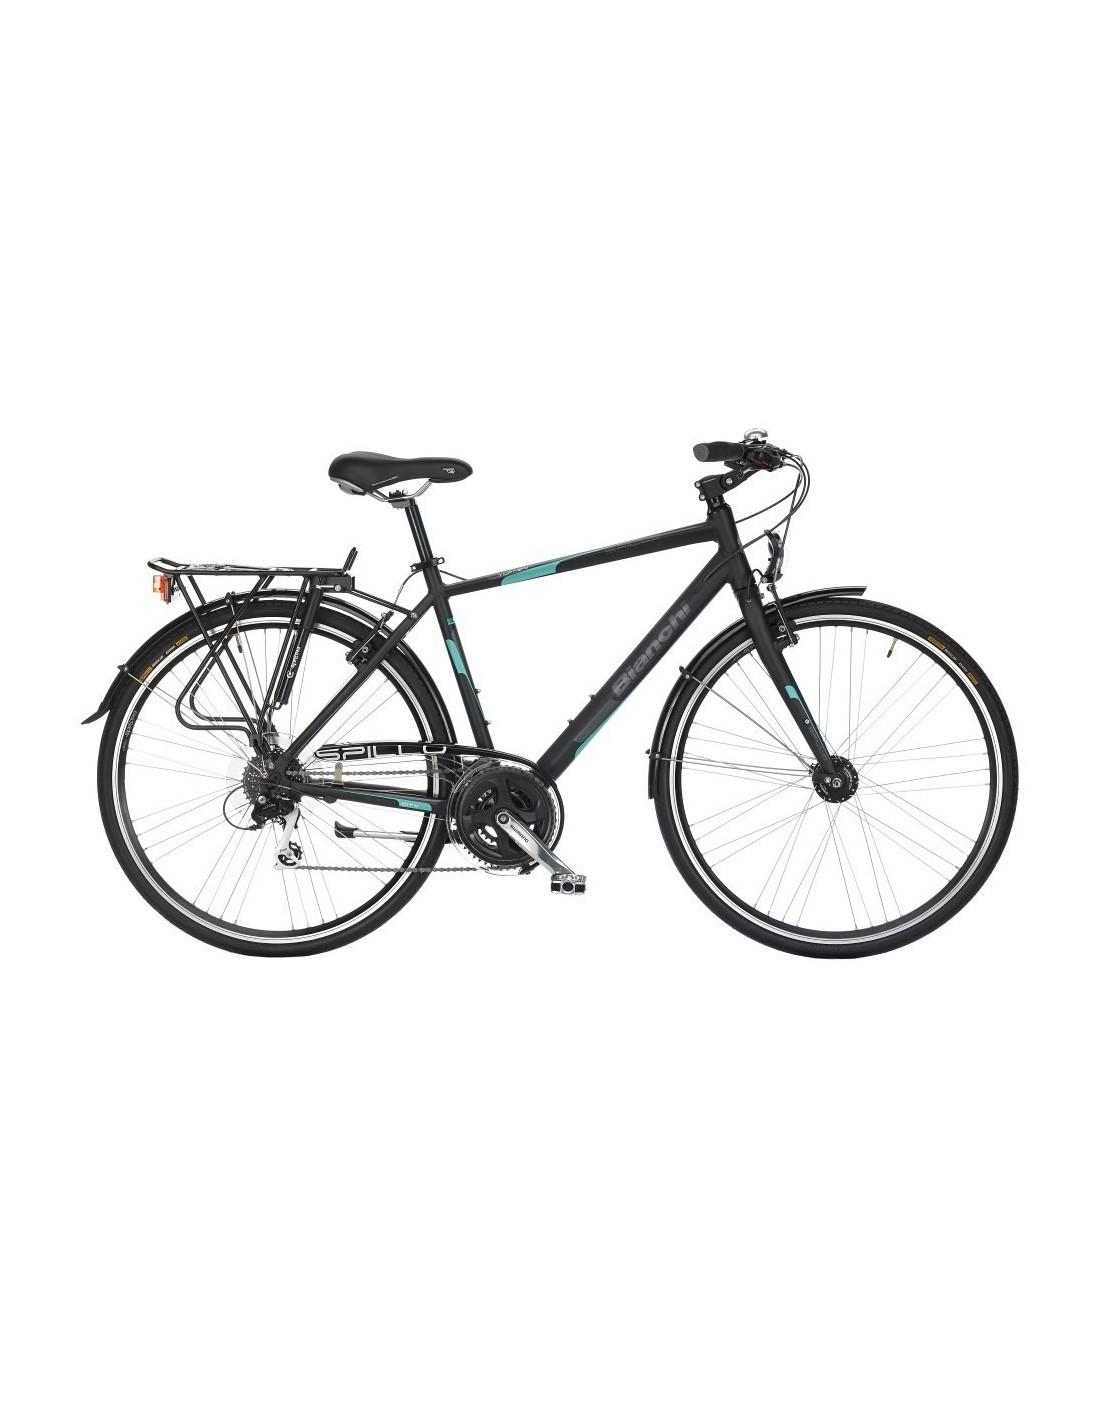 spillo topazio uomo city bike bianchi 2017. Black Bedroom Furniture Sets. Home Design Ideas